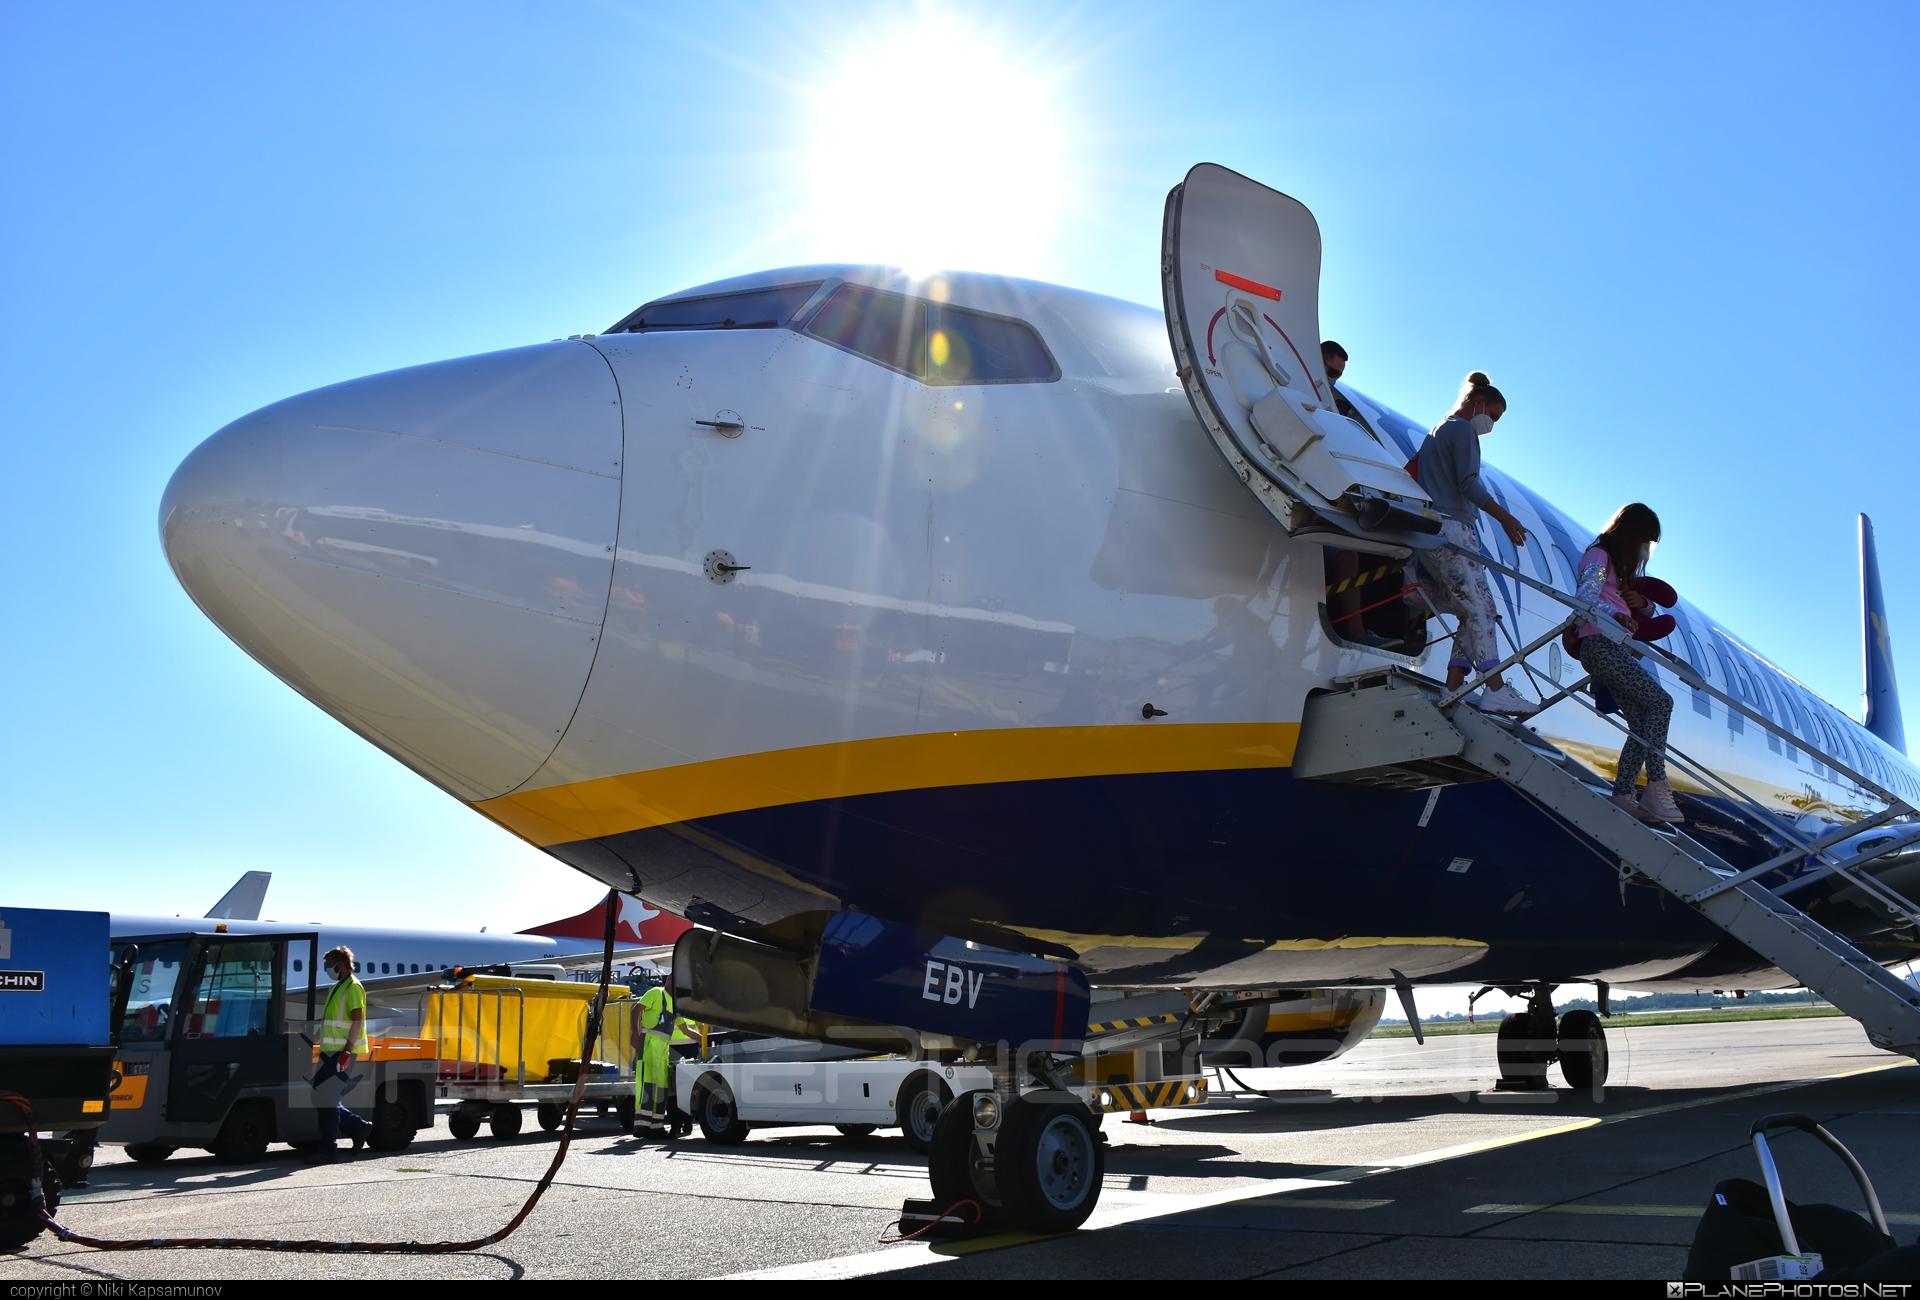 Boeing 737-800 - EI-EBV operated by Ryanair #b737 #b737nextgen #b737ng #boeing #boeing737 #ryanair